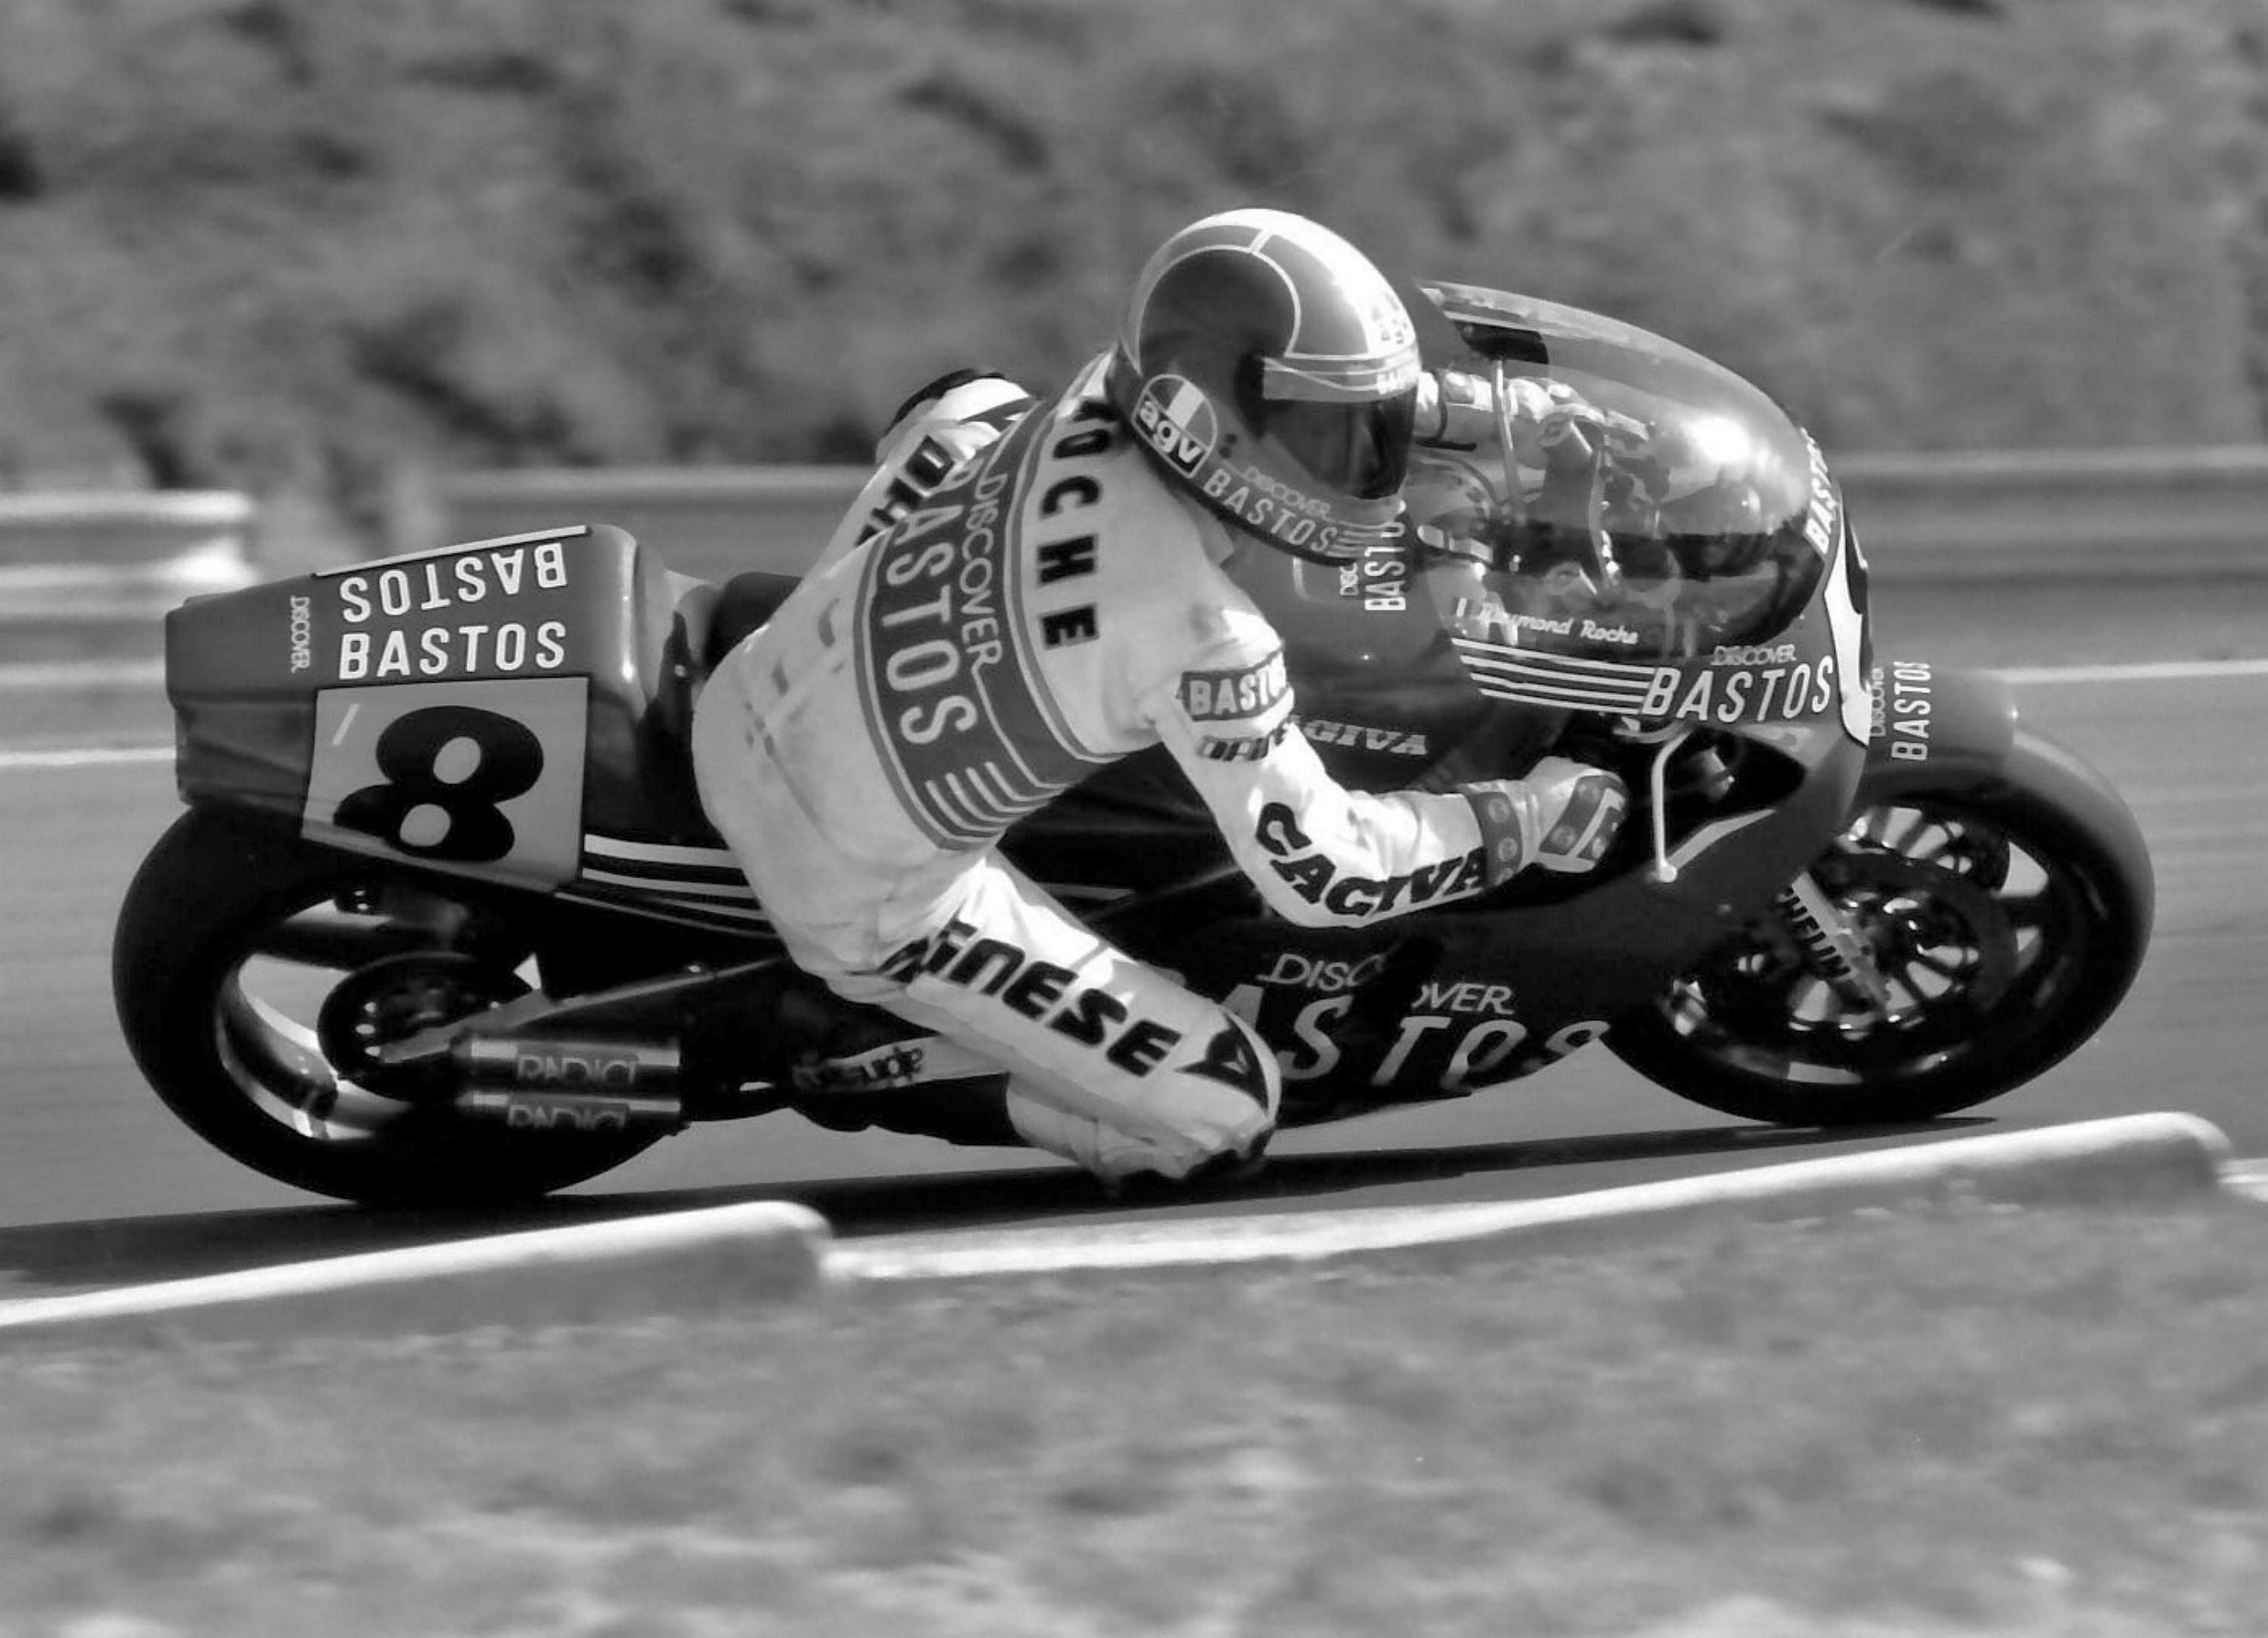 Raymond Roche 1987 in Brno. - Foto Frank Bischoff